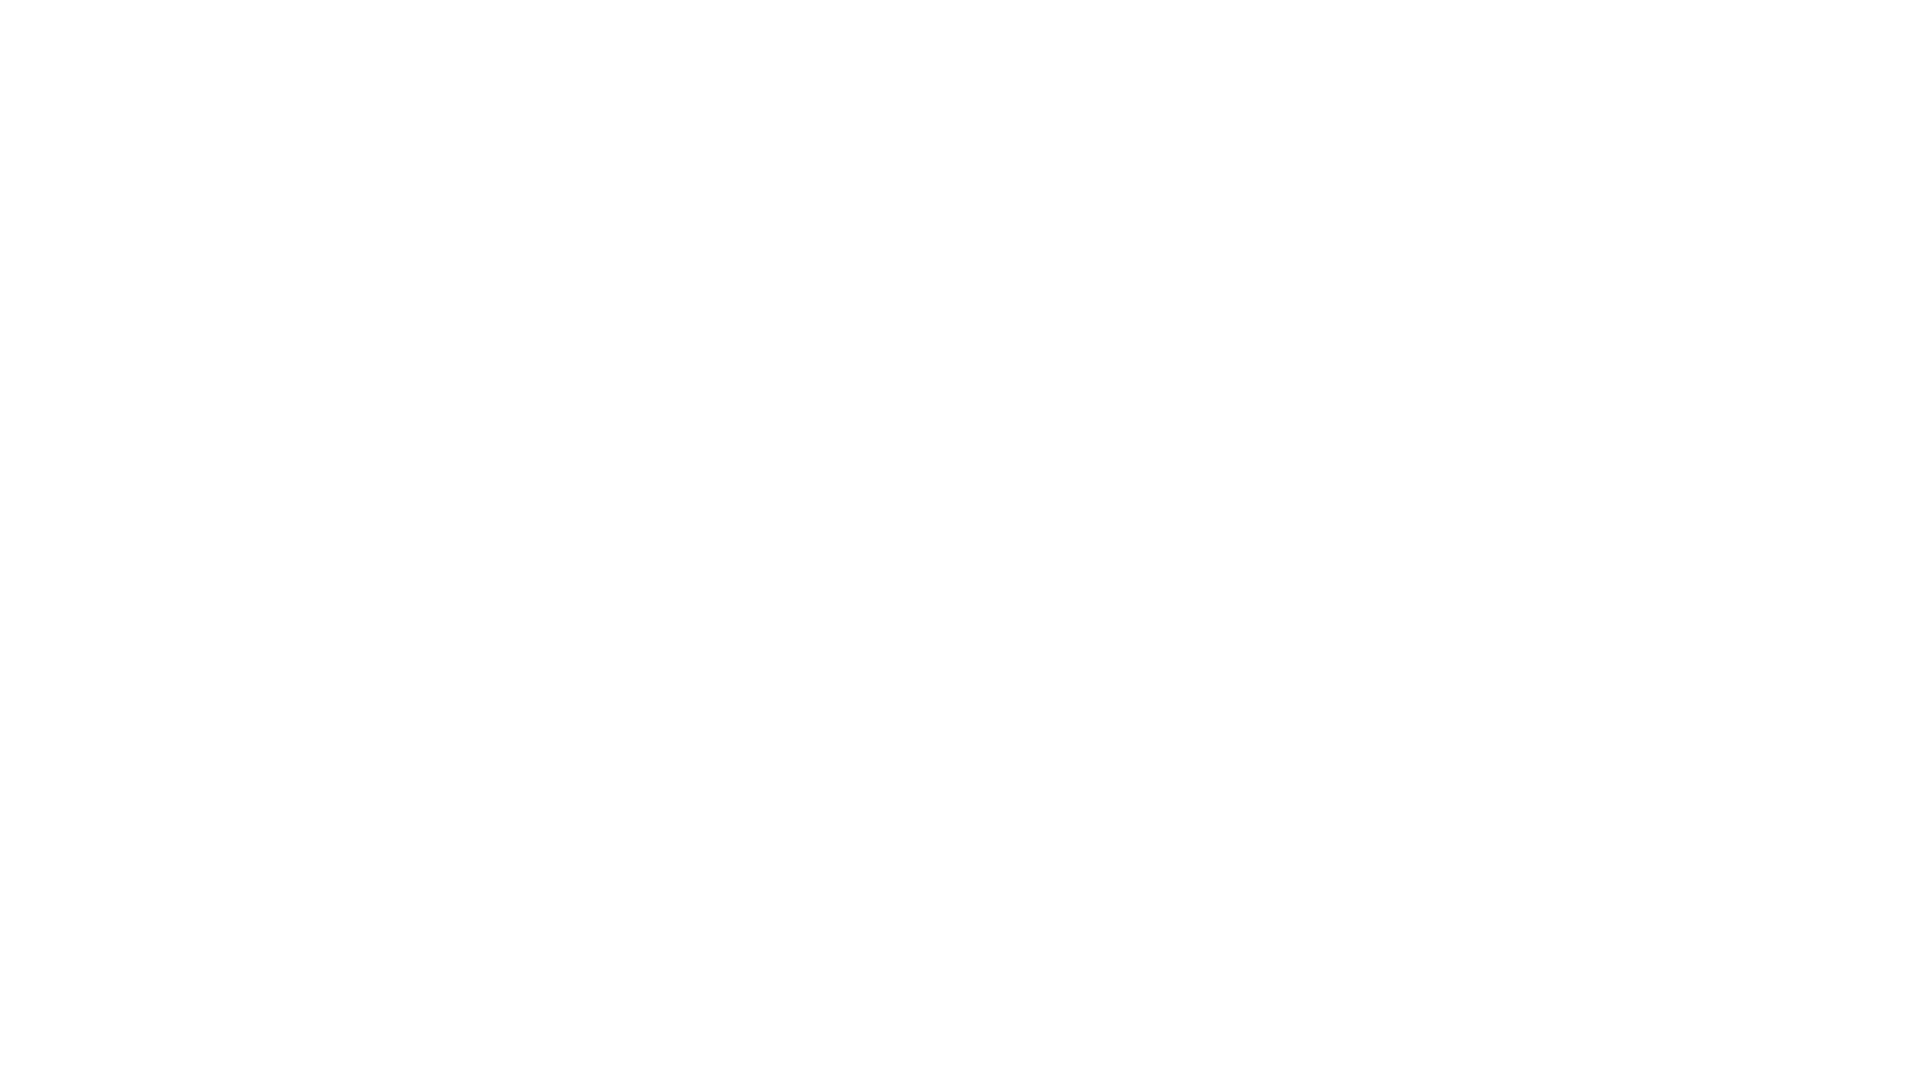 agricopter logo final 1920 x 1080 white